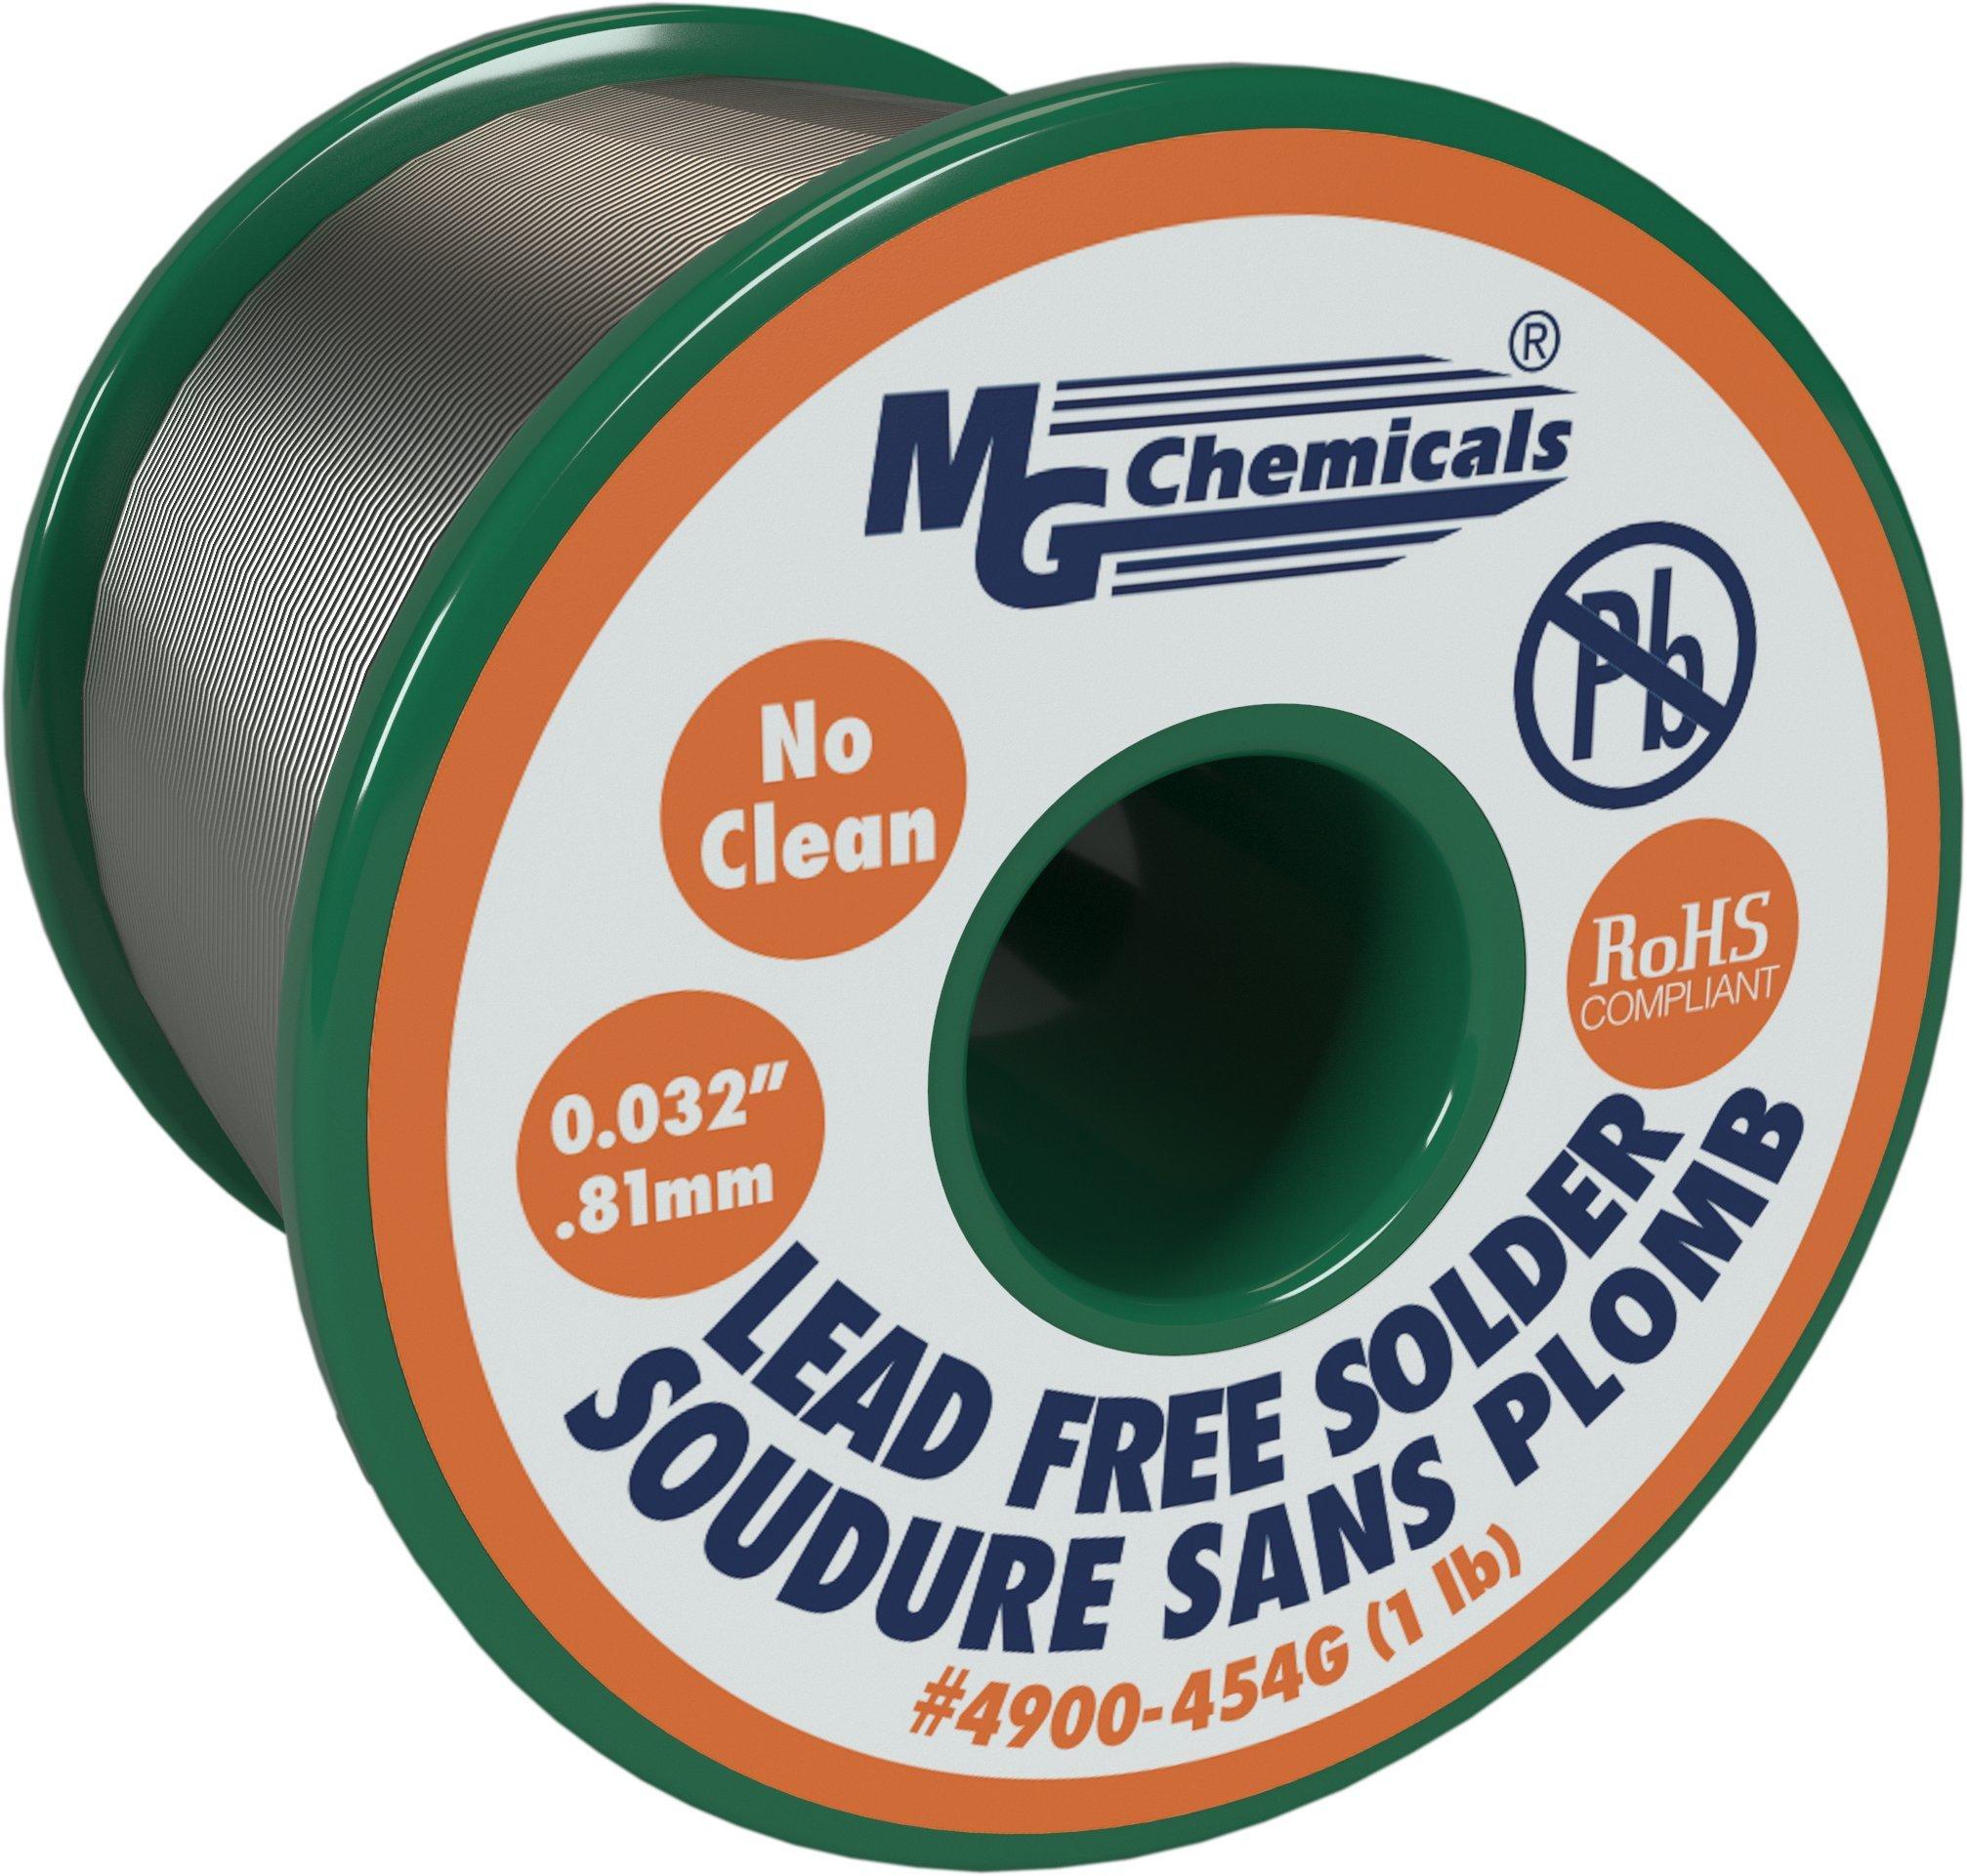 MG Chemicals SAC305, 96.3% Tin, 0.7% Copper, 3% Silver, No Clean Lead Free Solder, 0.032'' Diameter, 1 lbs Spool